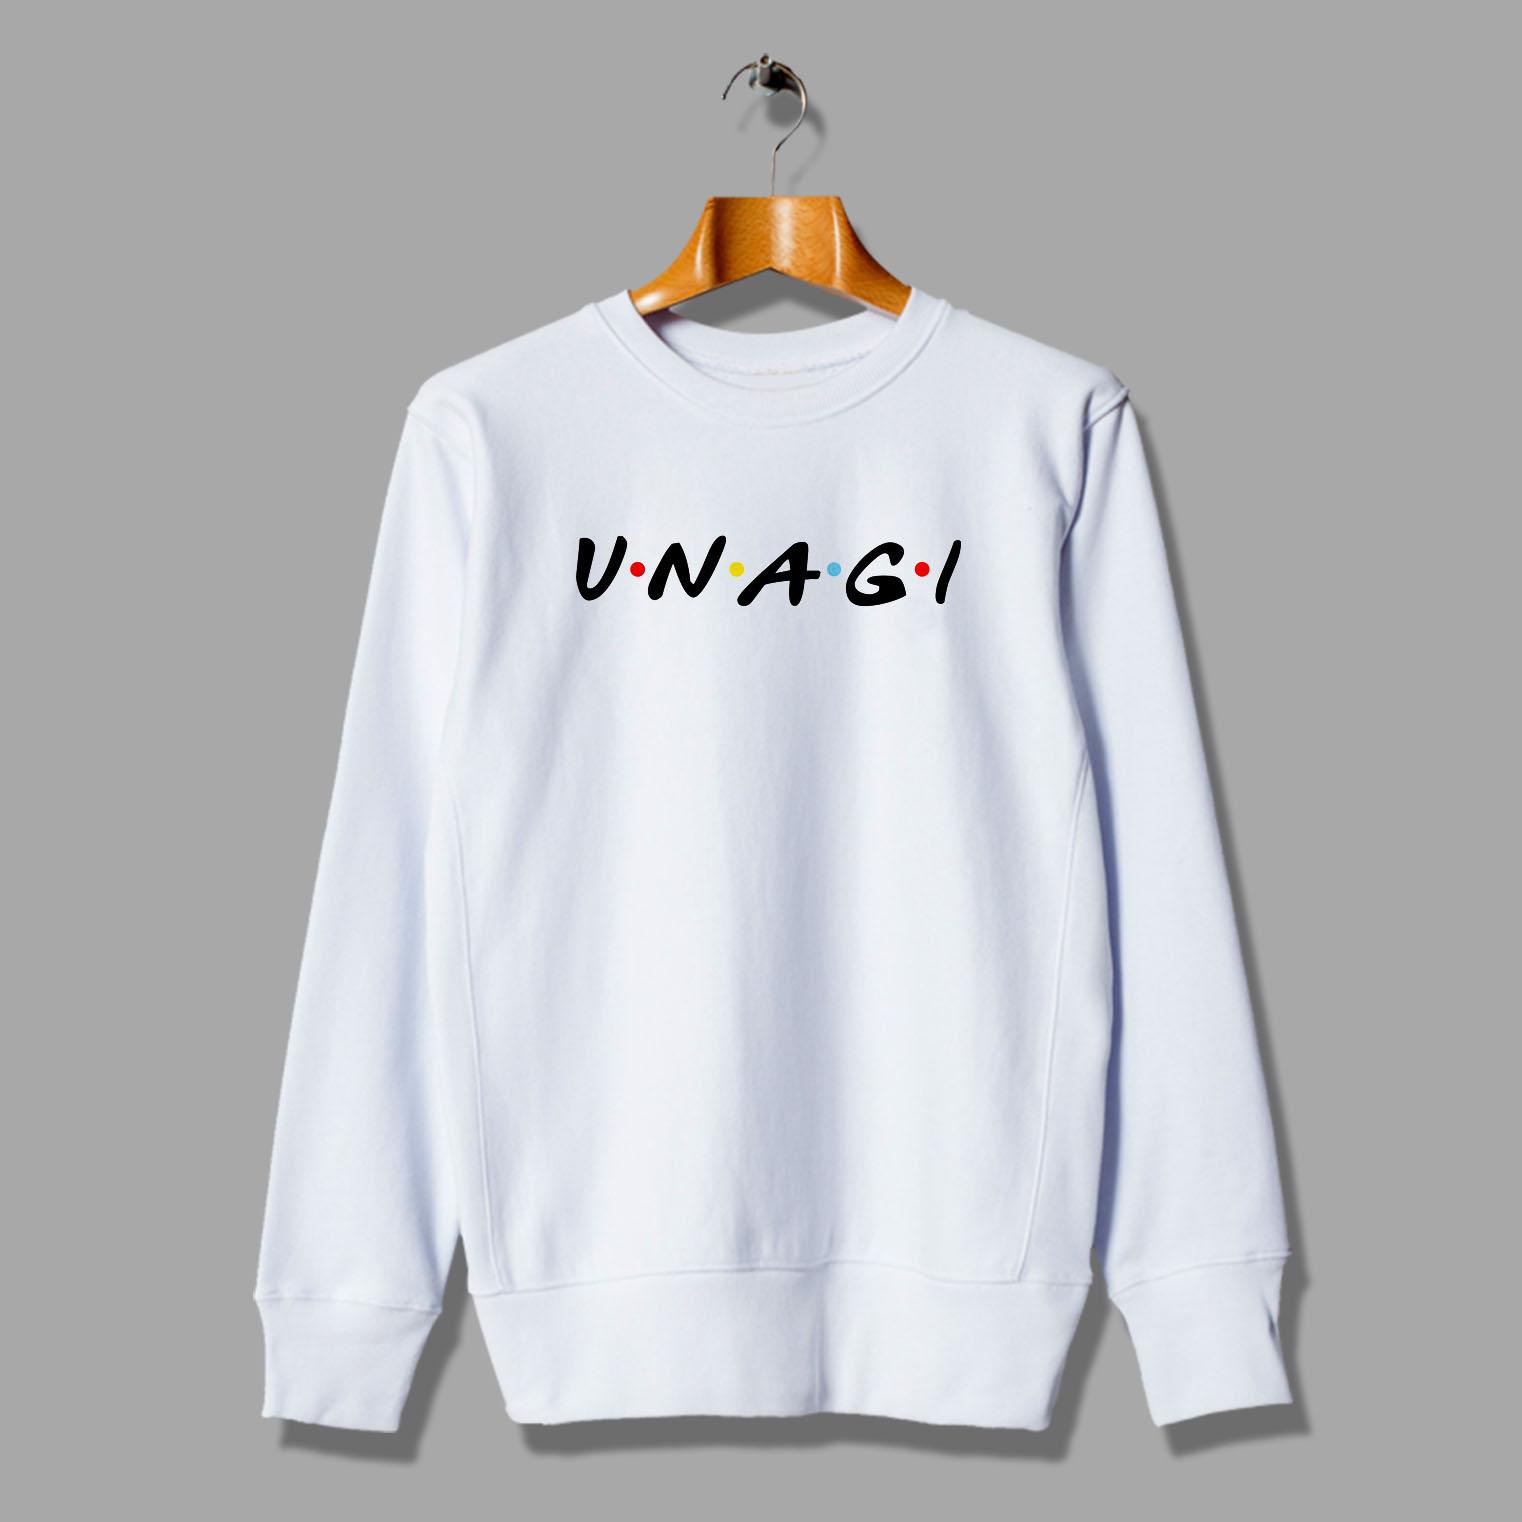 d556ea9b5fd Cute Unagi Friends TV Show Unisex Sweatshirt Parody - Hotvero